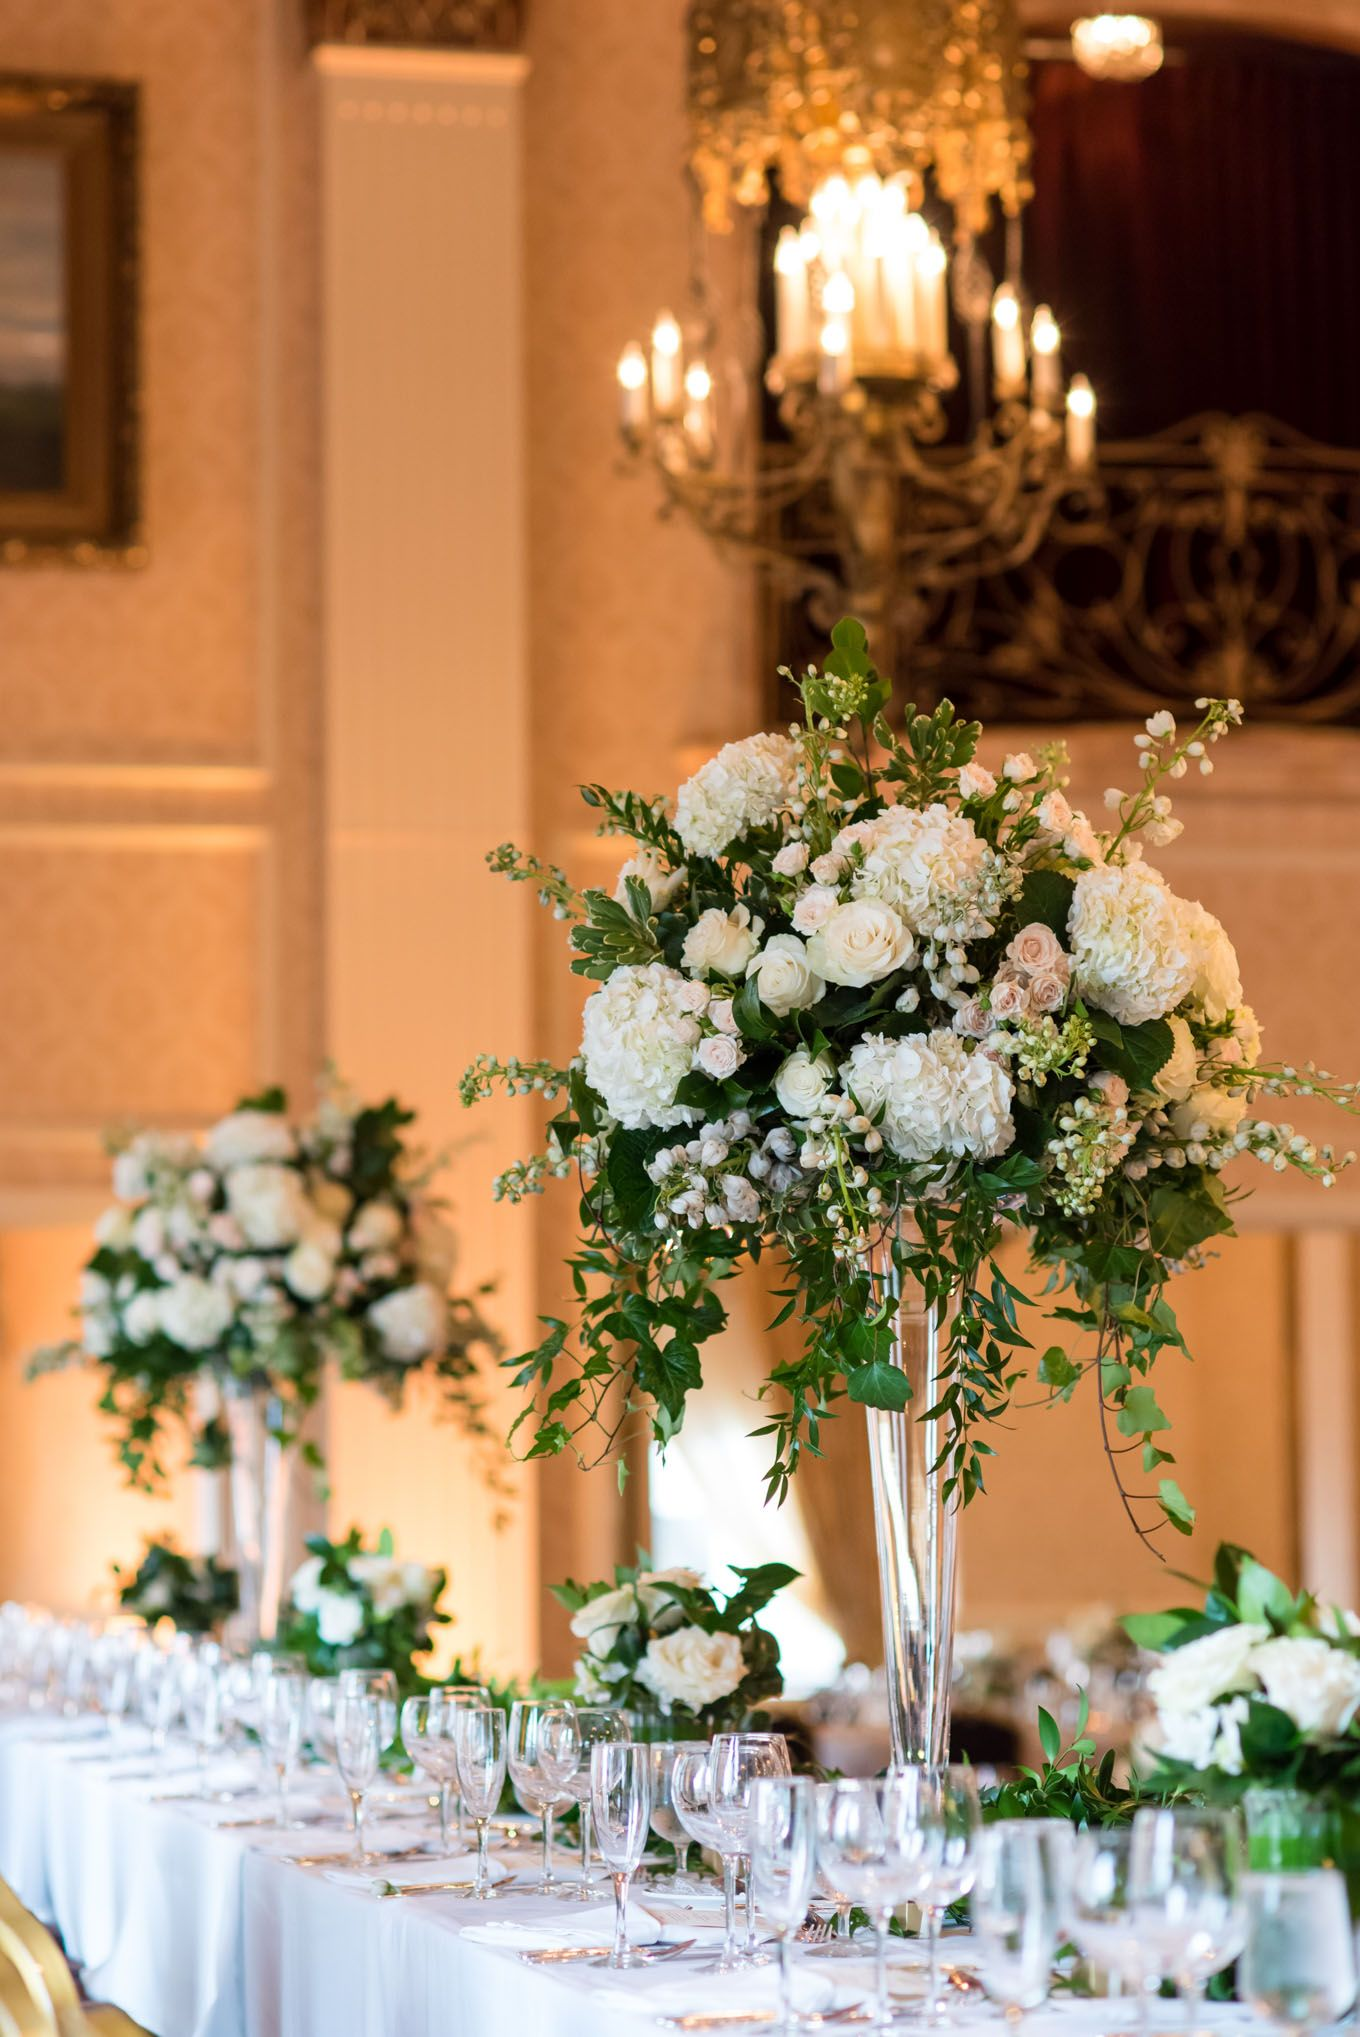 Wedding Wednesday #2: Our Wedding Reception! - MEMORANDUM ...